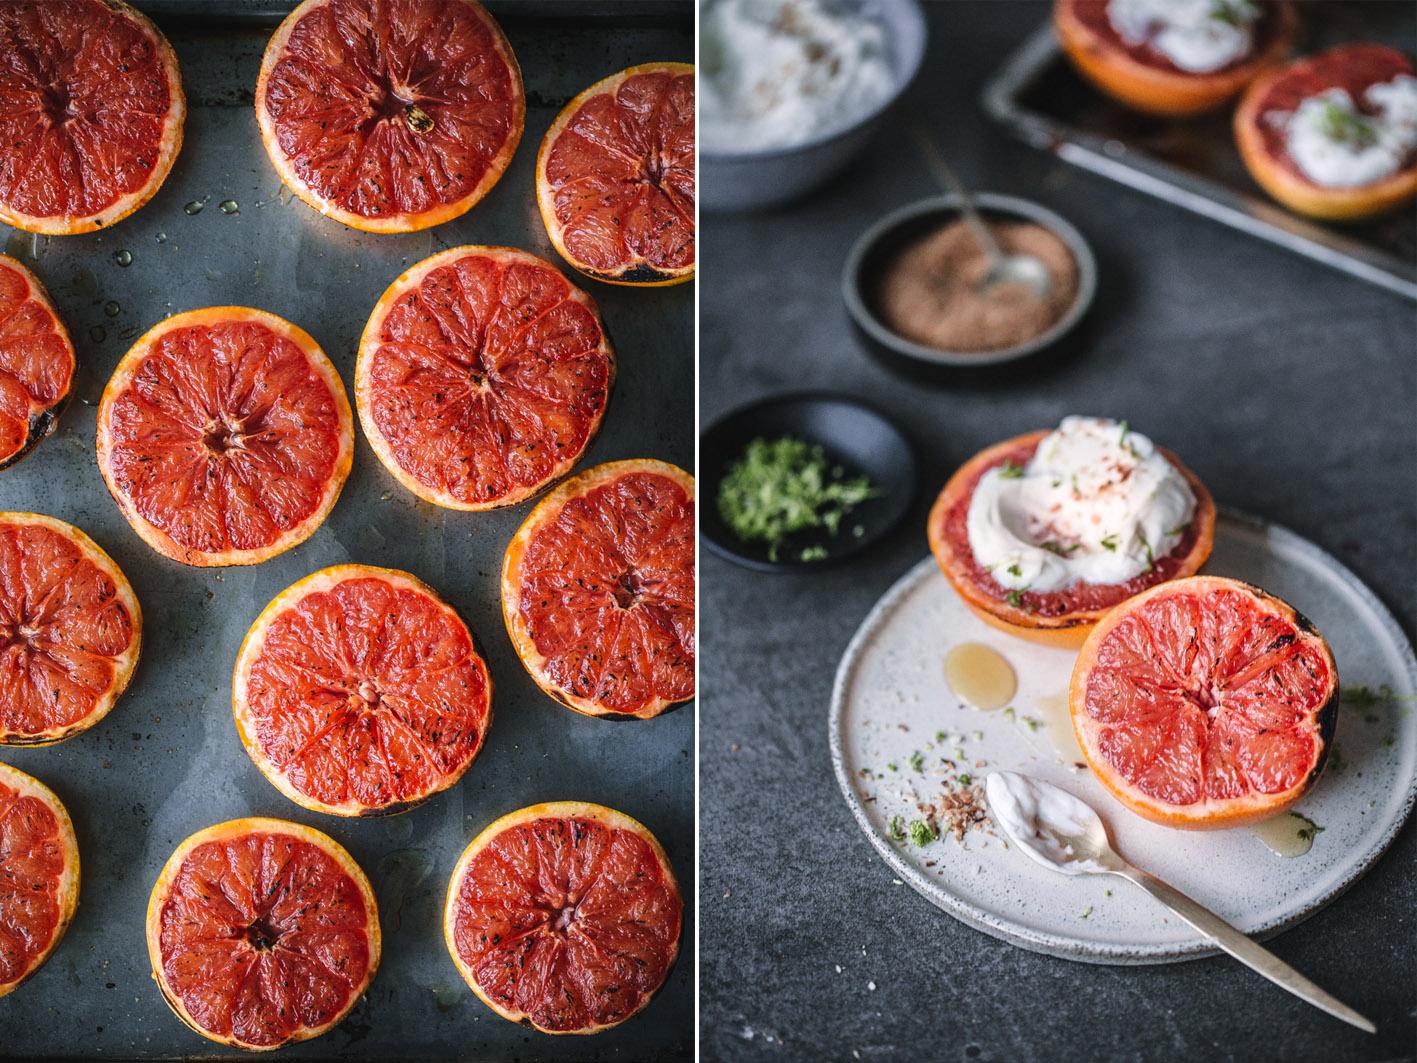 Gegrillte Grapefruits mit Kokosjoghurt